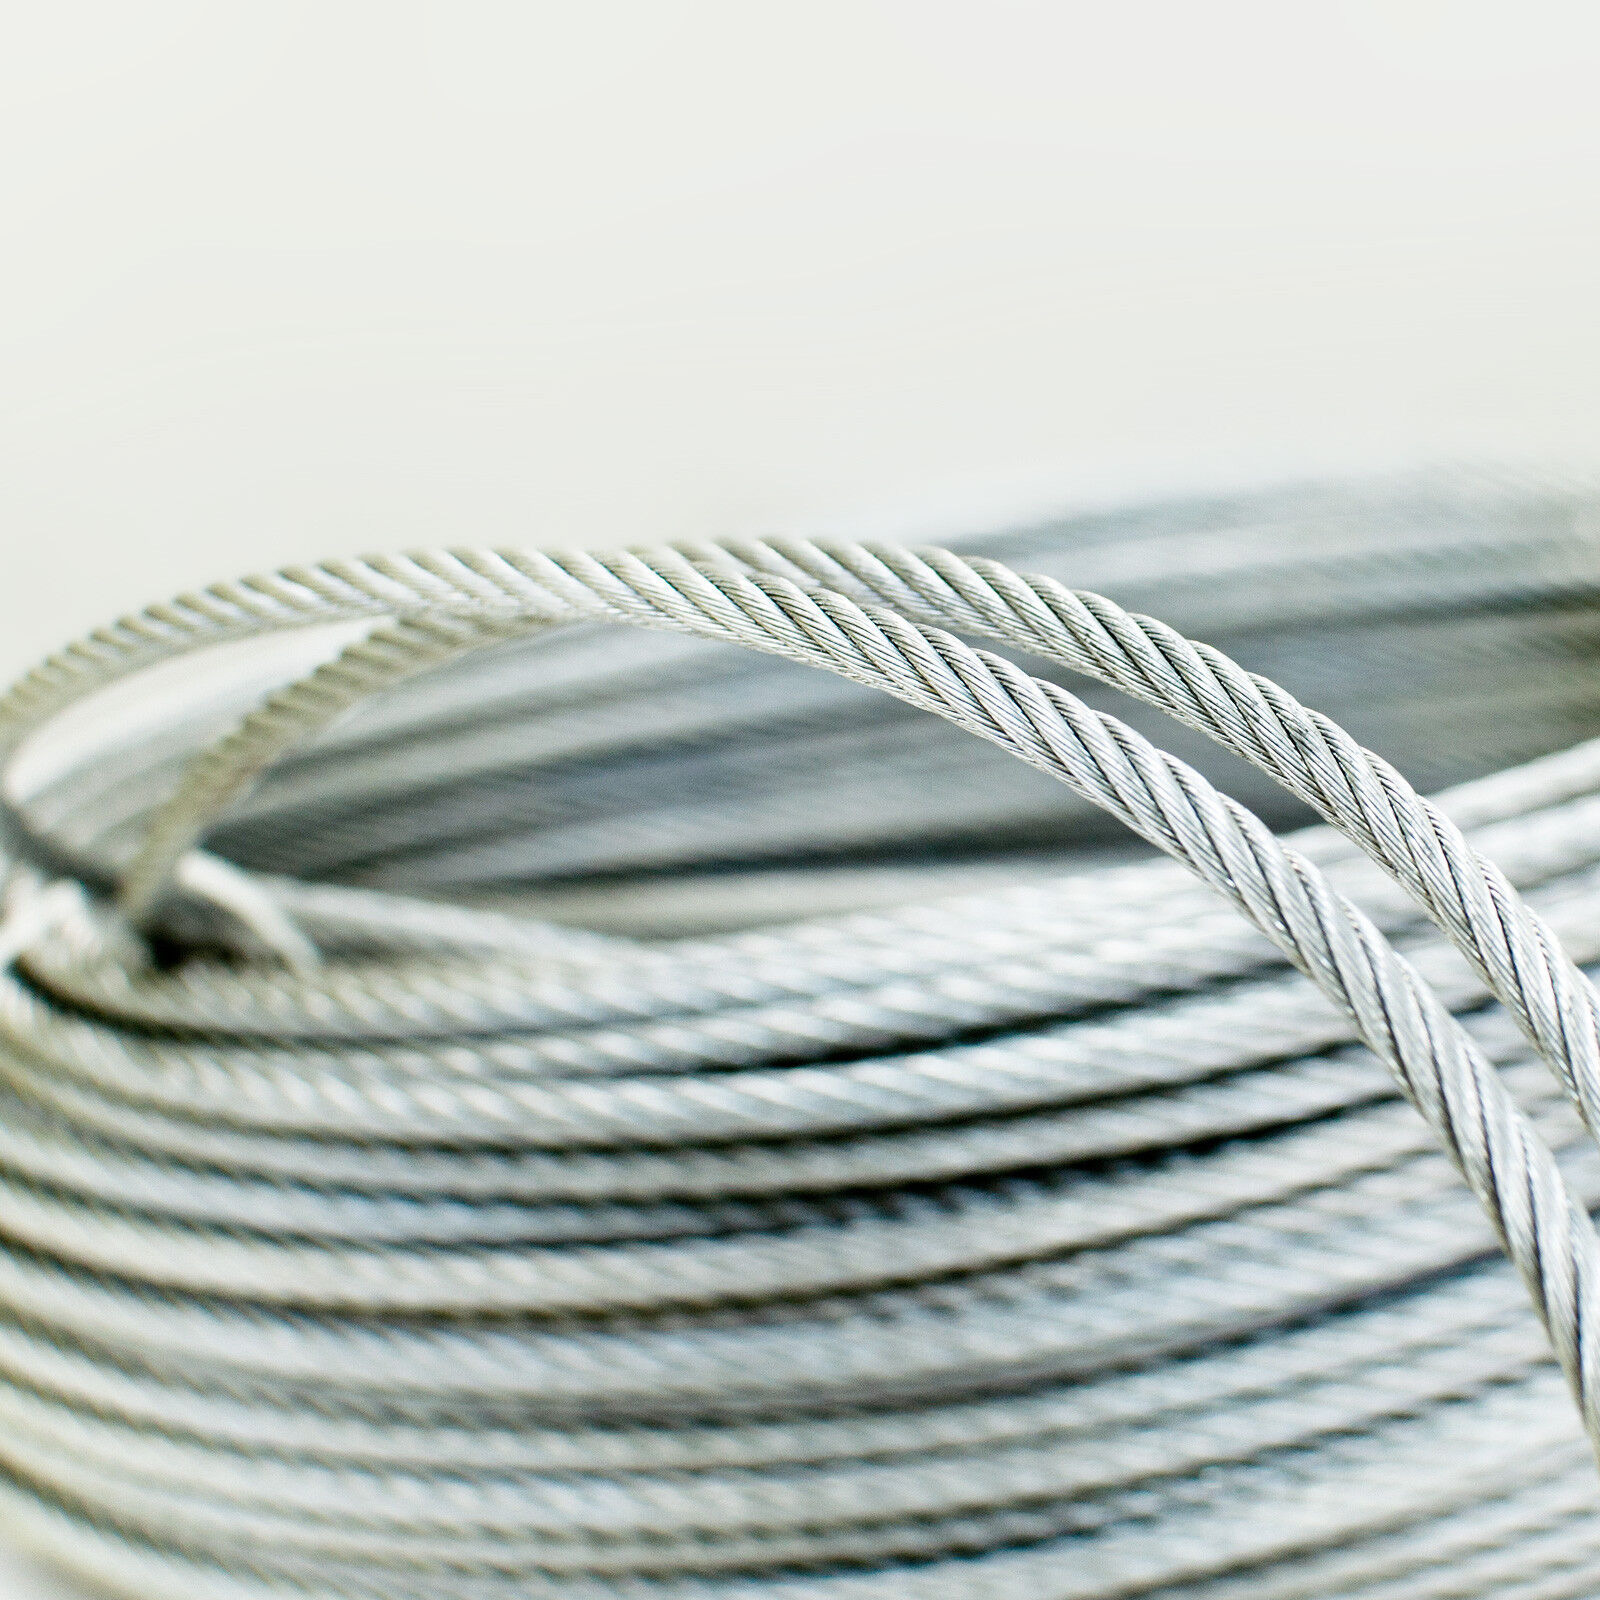 Edelstahlseil 1mm bis 8mm Stahlseil Edelstahl Drahtseil V4A Inox Seile rostfrei